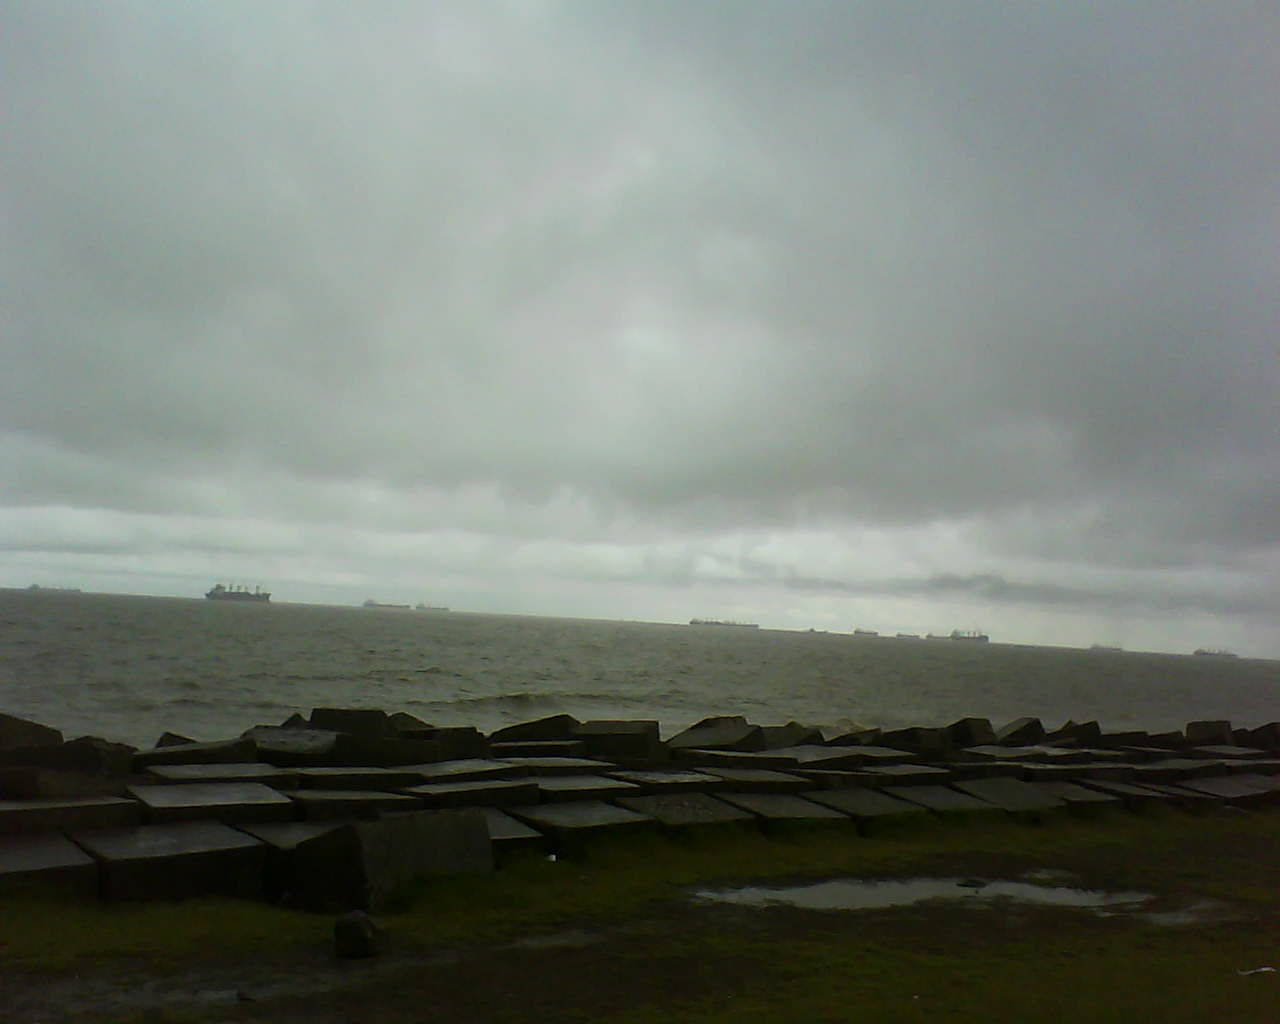 File:Patenga Beach Cloudy Weather.jpg